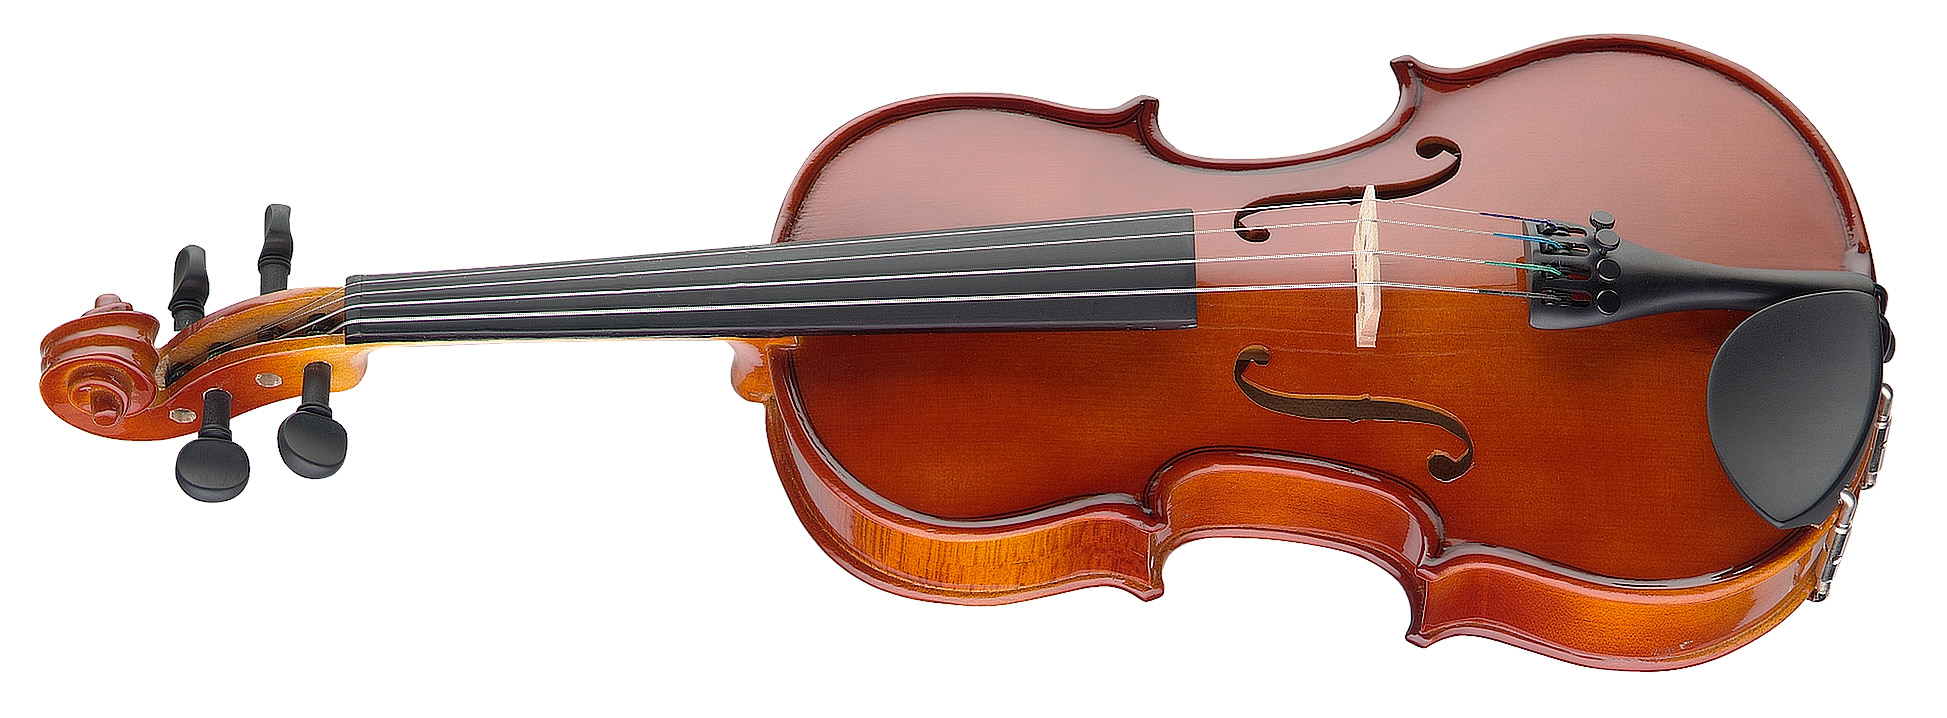 STAGG VN-1/2 EF Fiolin m/case